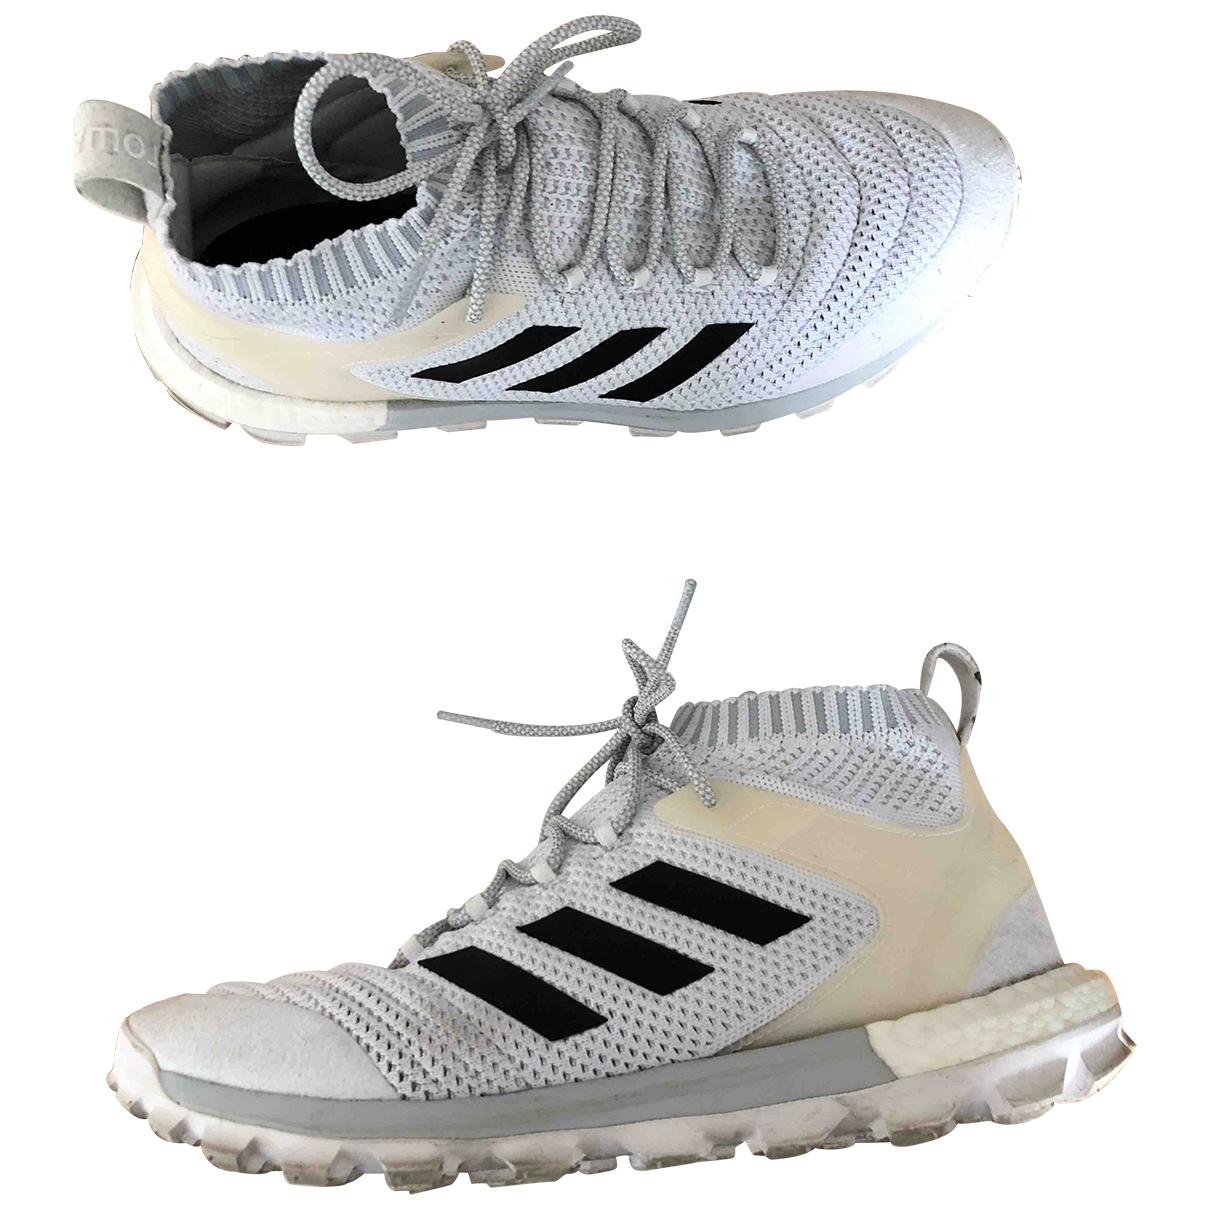 Adidas X Gosha Rubchinskiy - Baskets   pour homme en toile - blanc